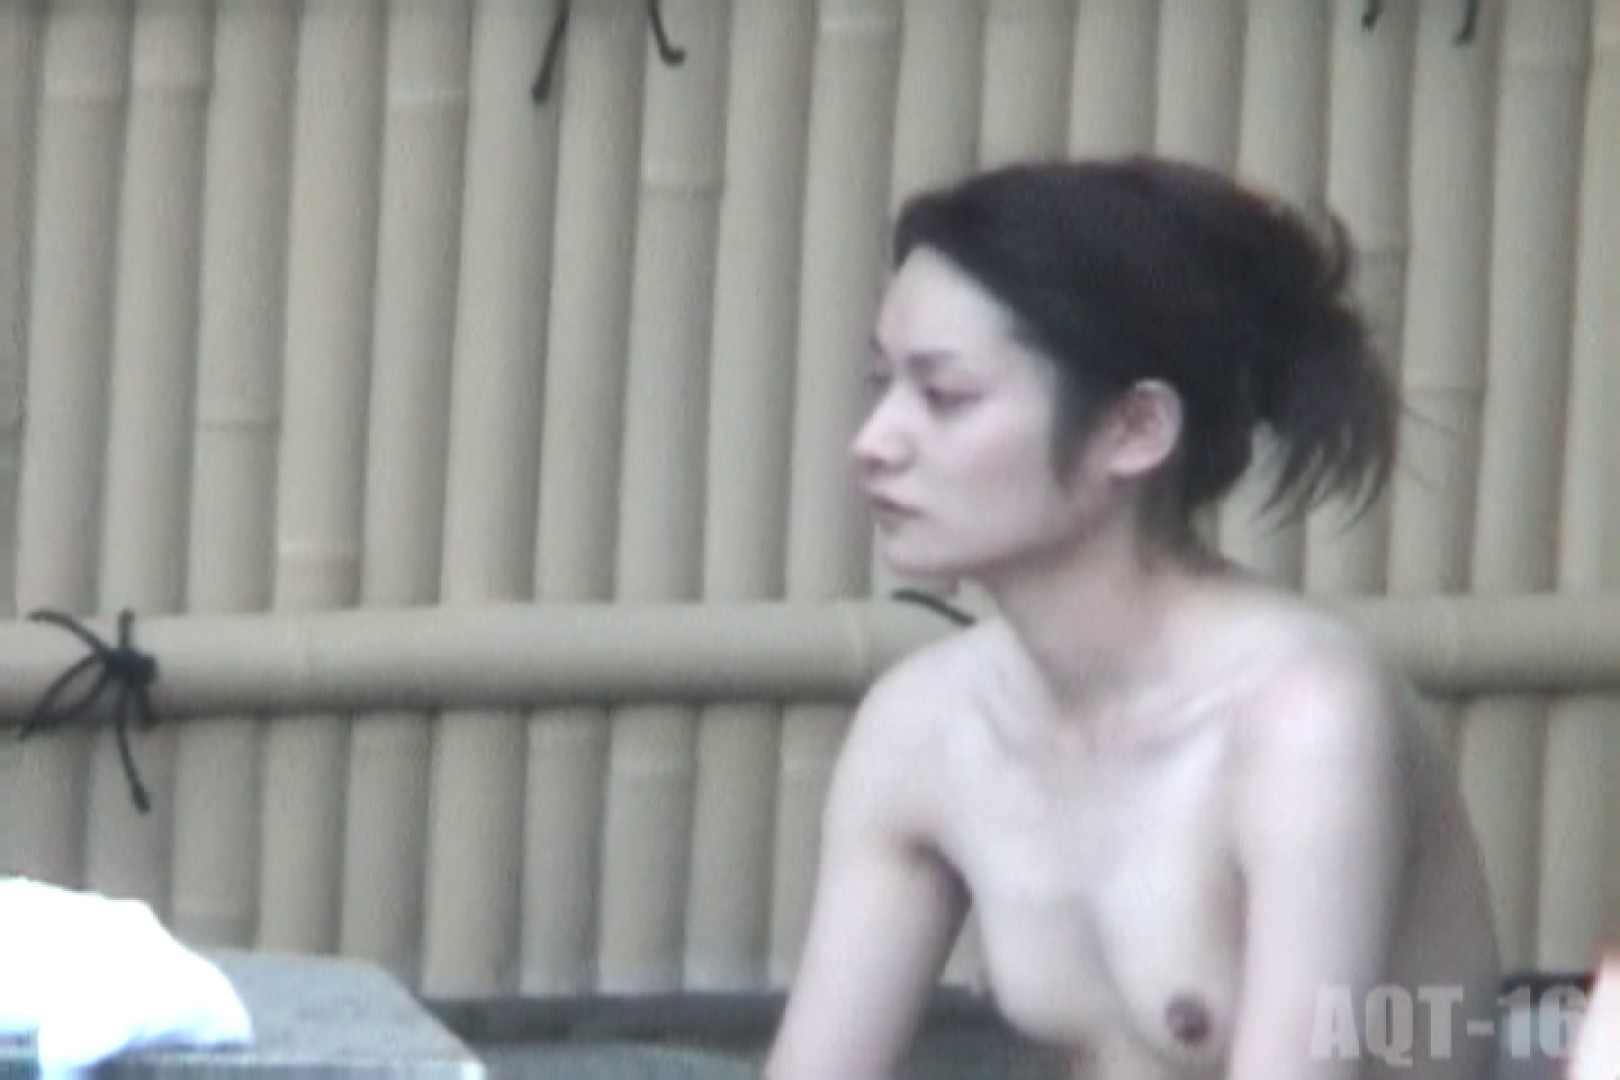 Aquaな露天風呂Vol.839 0  12連発 8